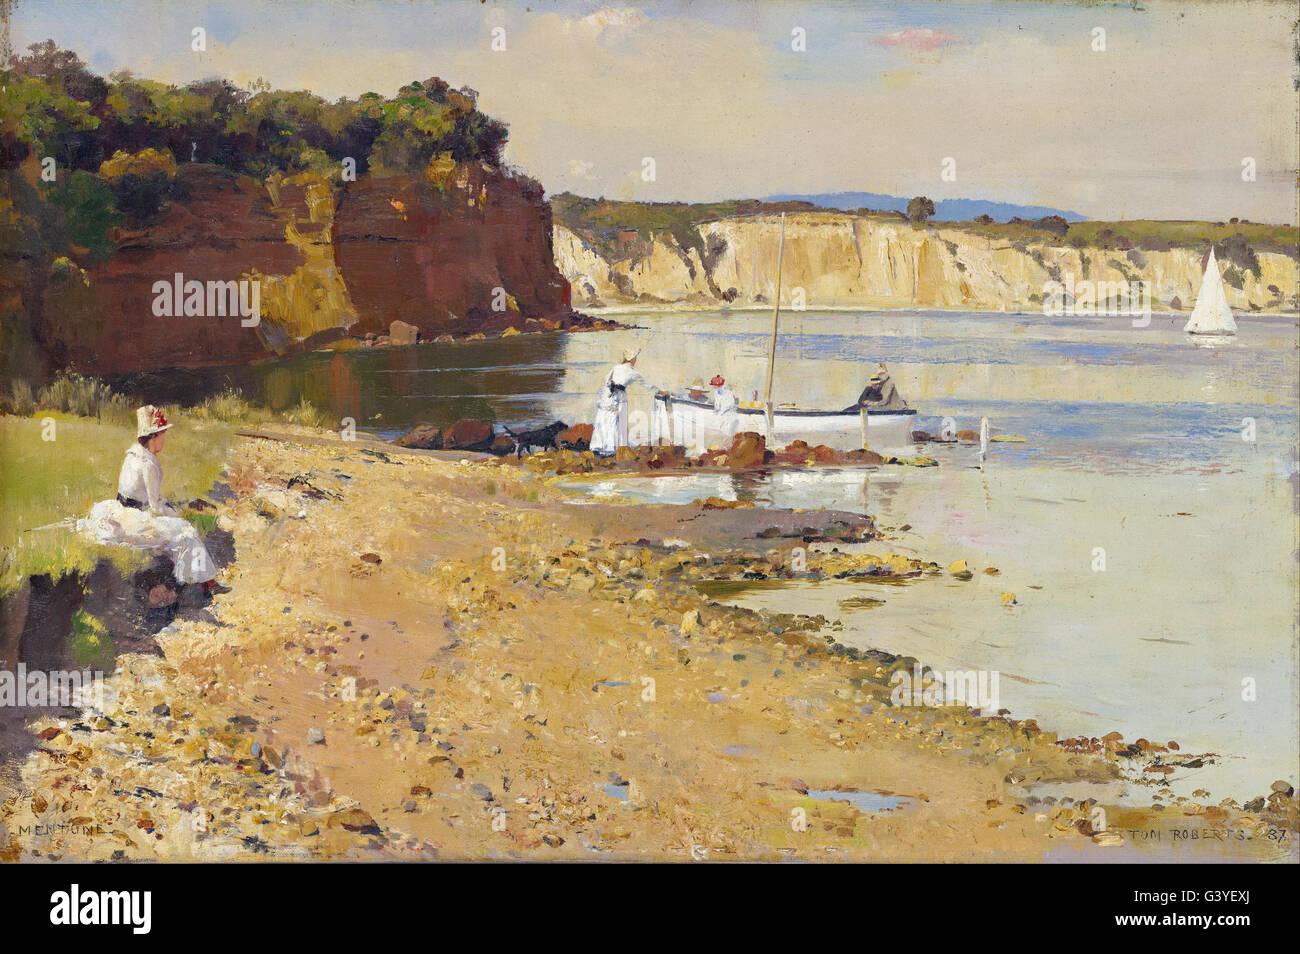 Tom Roberts - Slumbering sea, Mentone - Stock Image